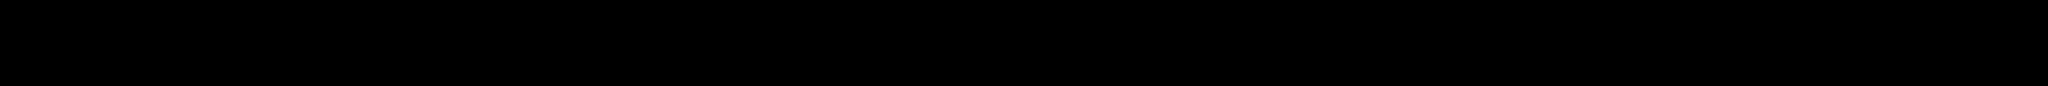 SKF 1J0 498 625, 1J0 498 625 A, 1J0 598 625, 1J0 498 625, 1J0 598 625 Radlagersatz